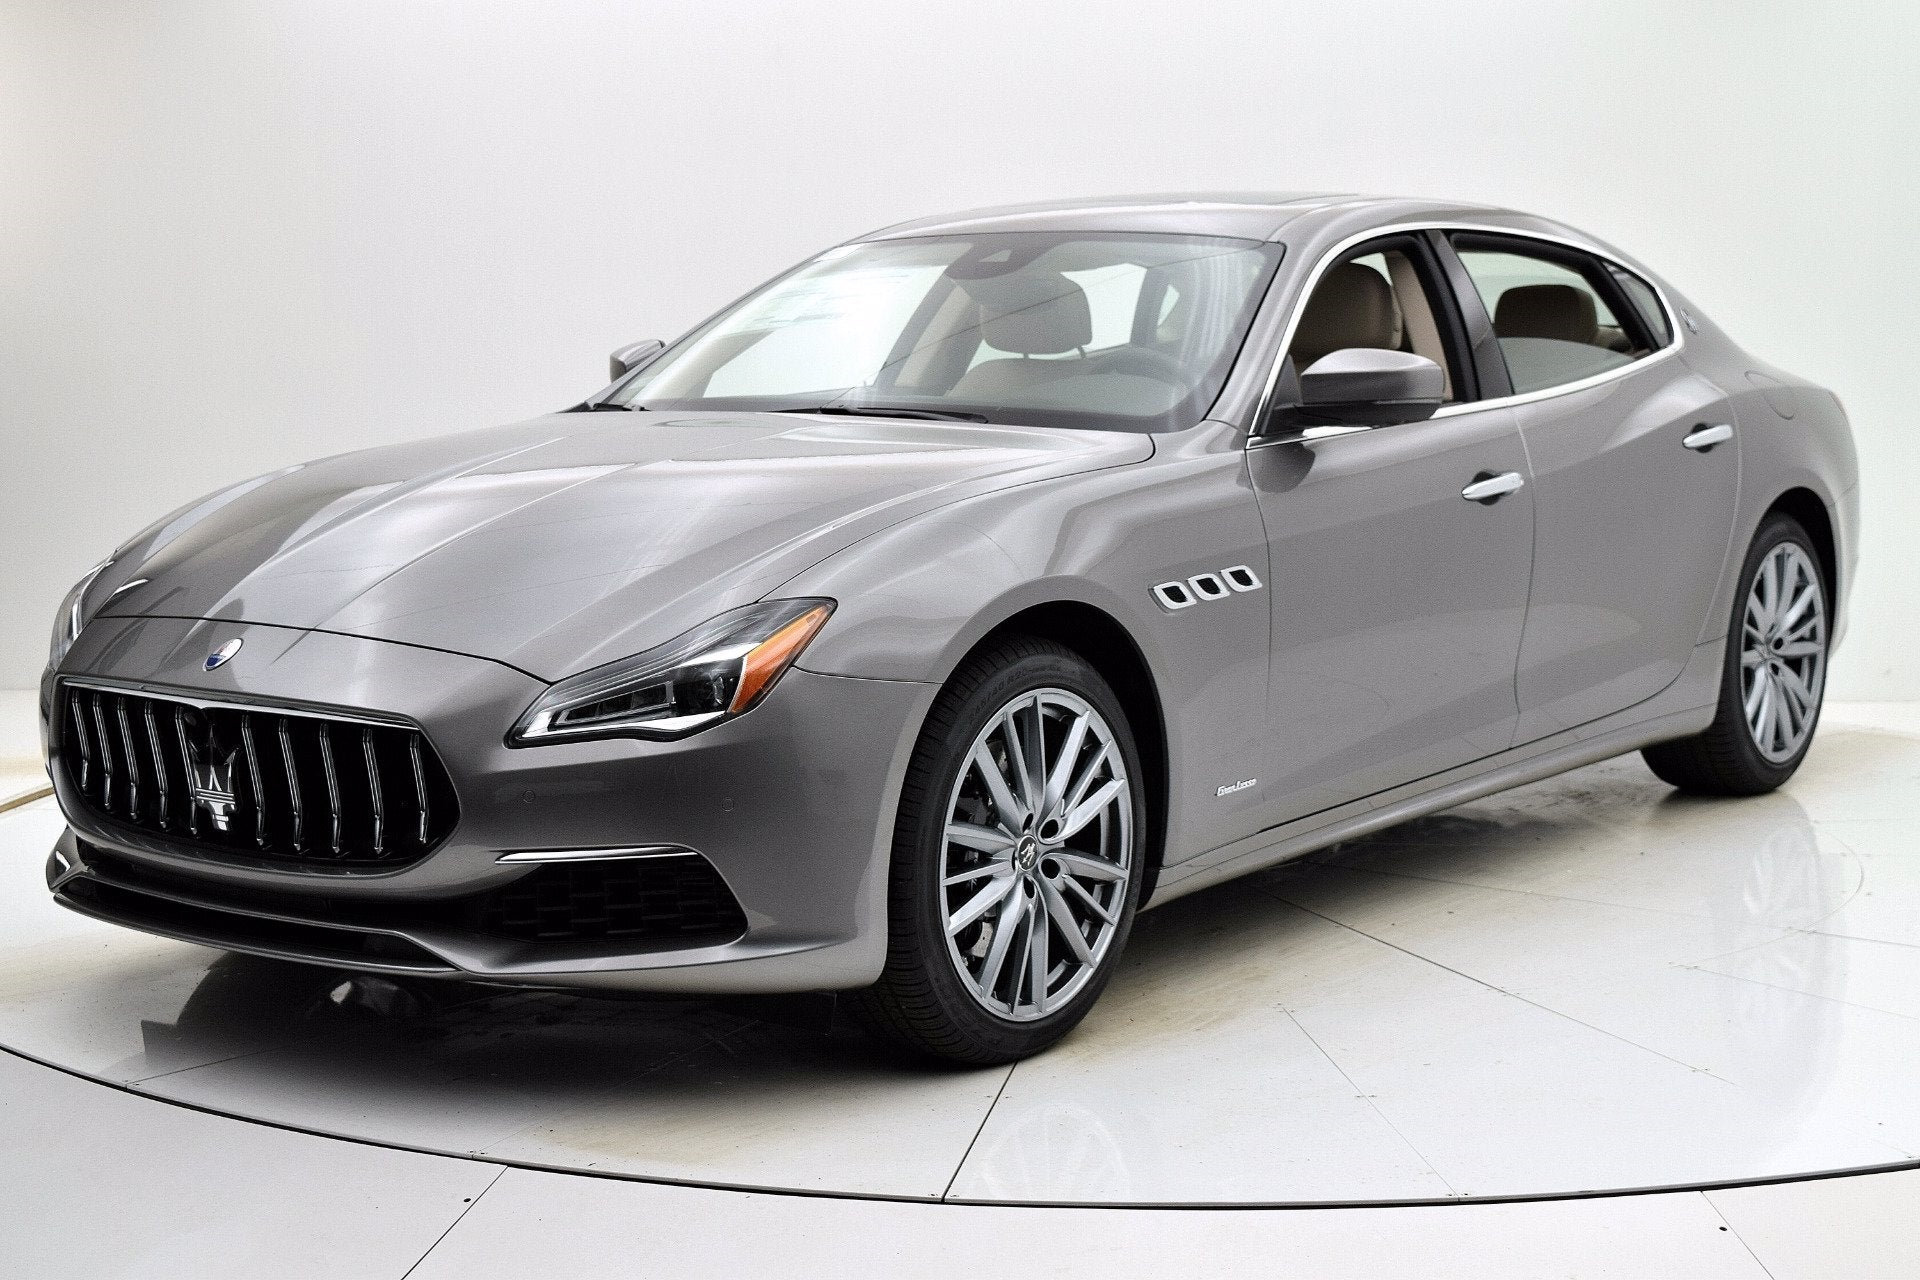 Thumbnail - 2021 Maserati Quattroporte